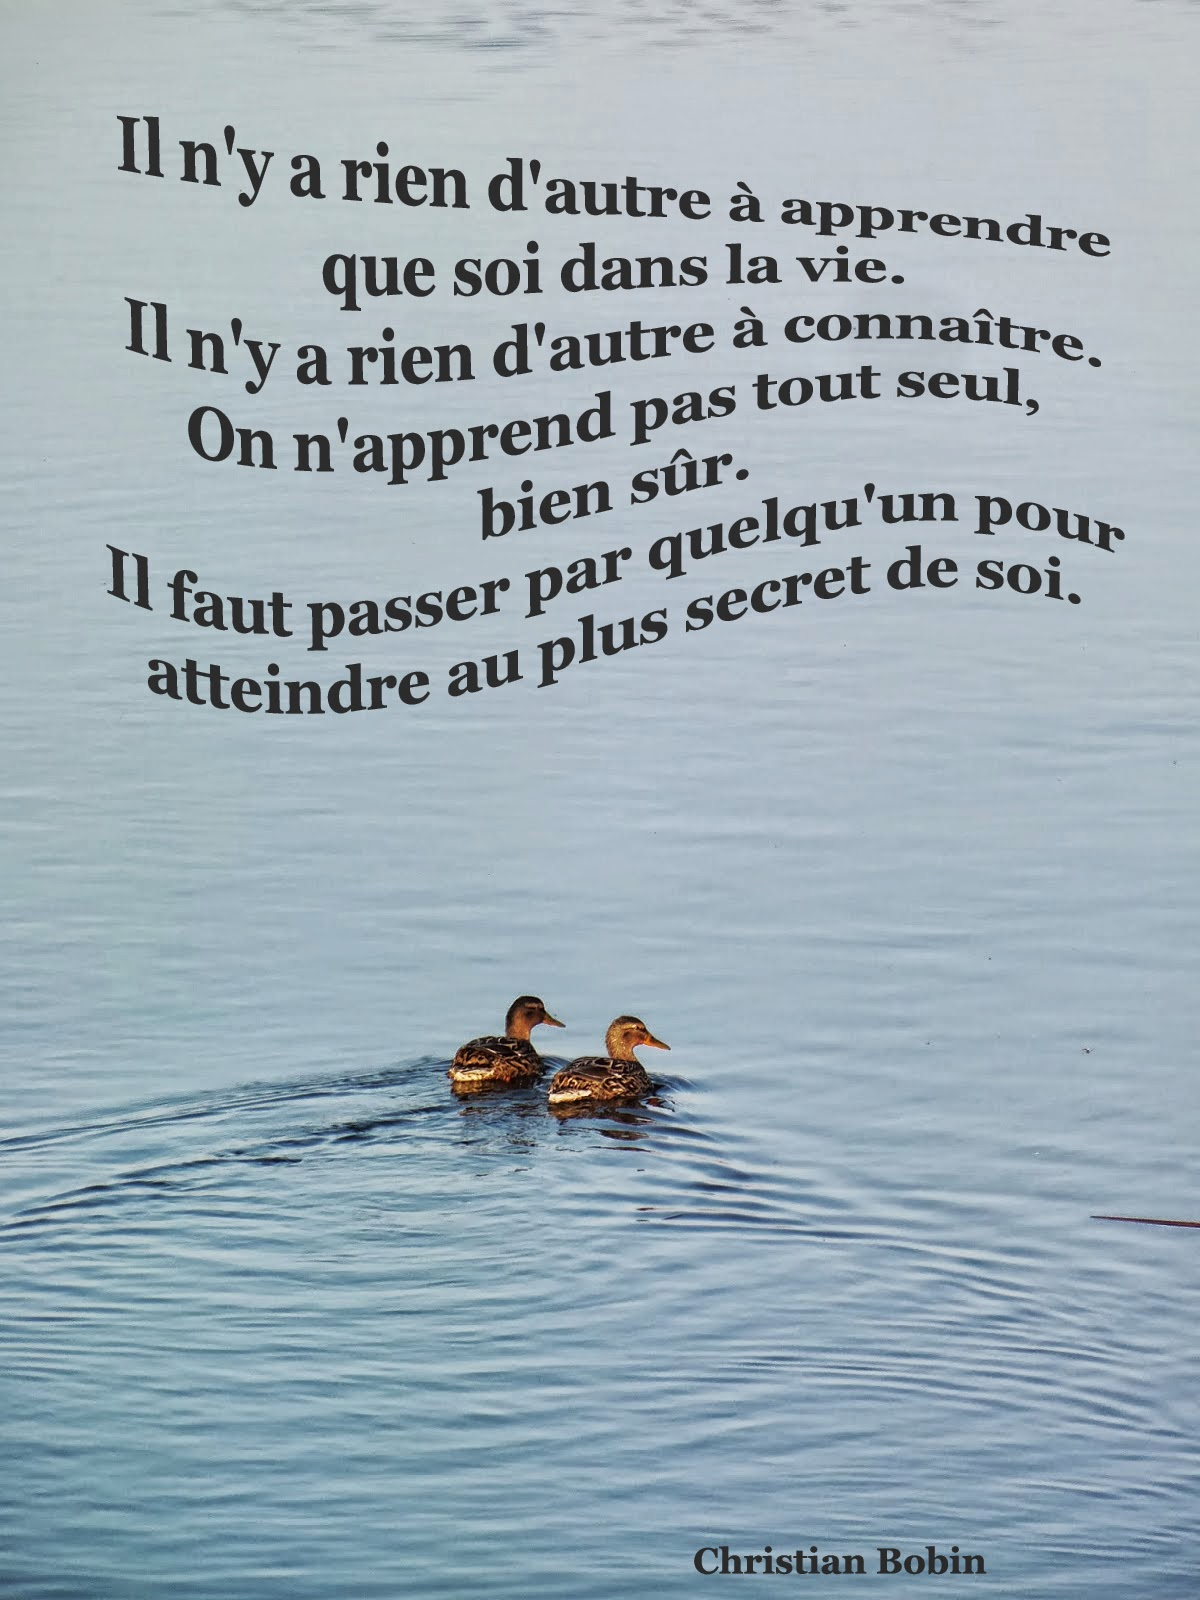 Christian Bobin (auteur) - Page 3 Couple+canard+citation+bobin